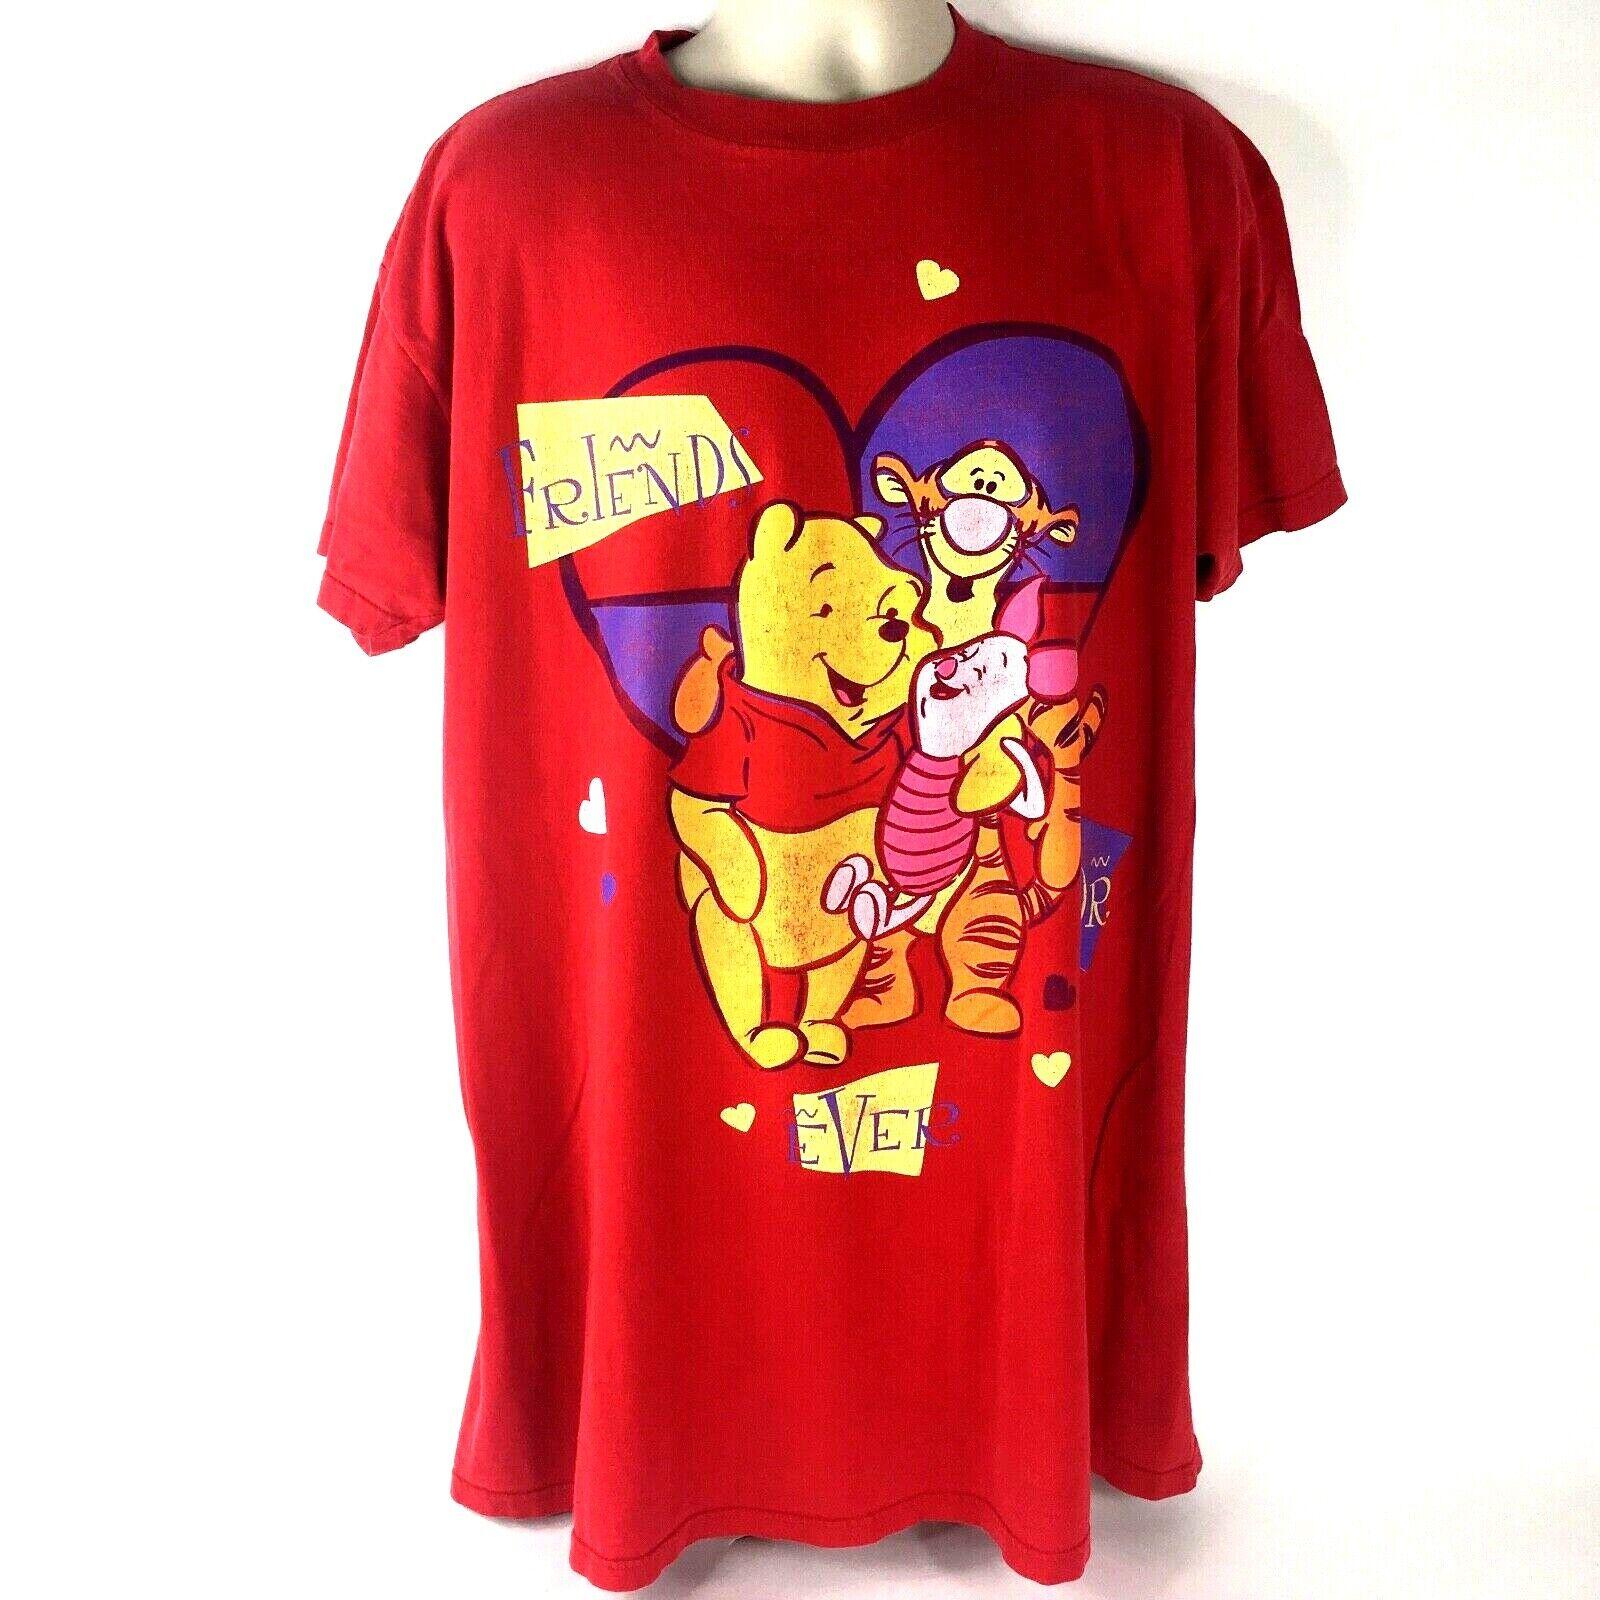 Disney Sleepwear Pooh One Size Fits All Vintage T-Shirt Friends for Ev Tigger